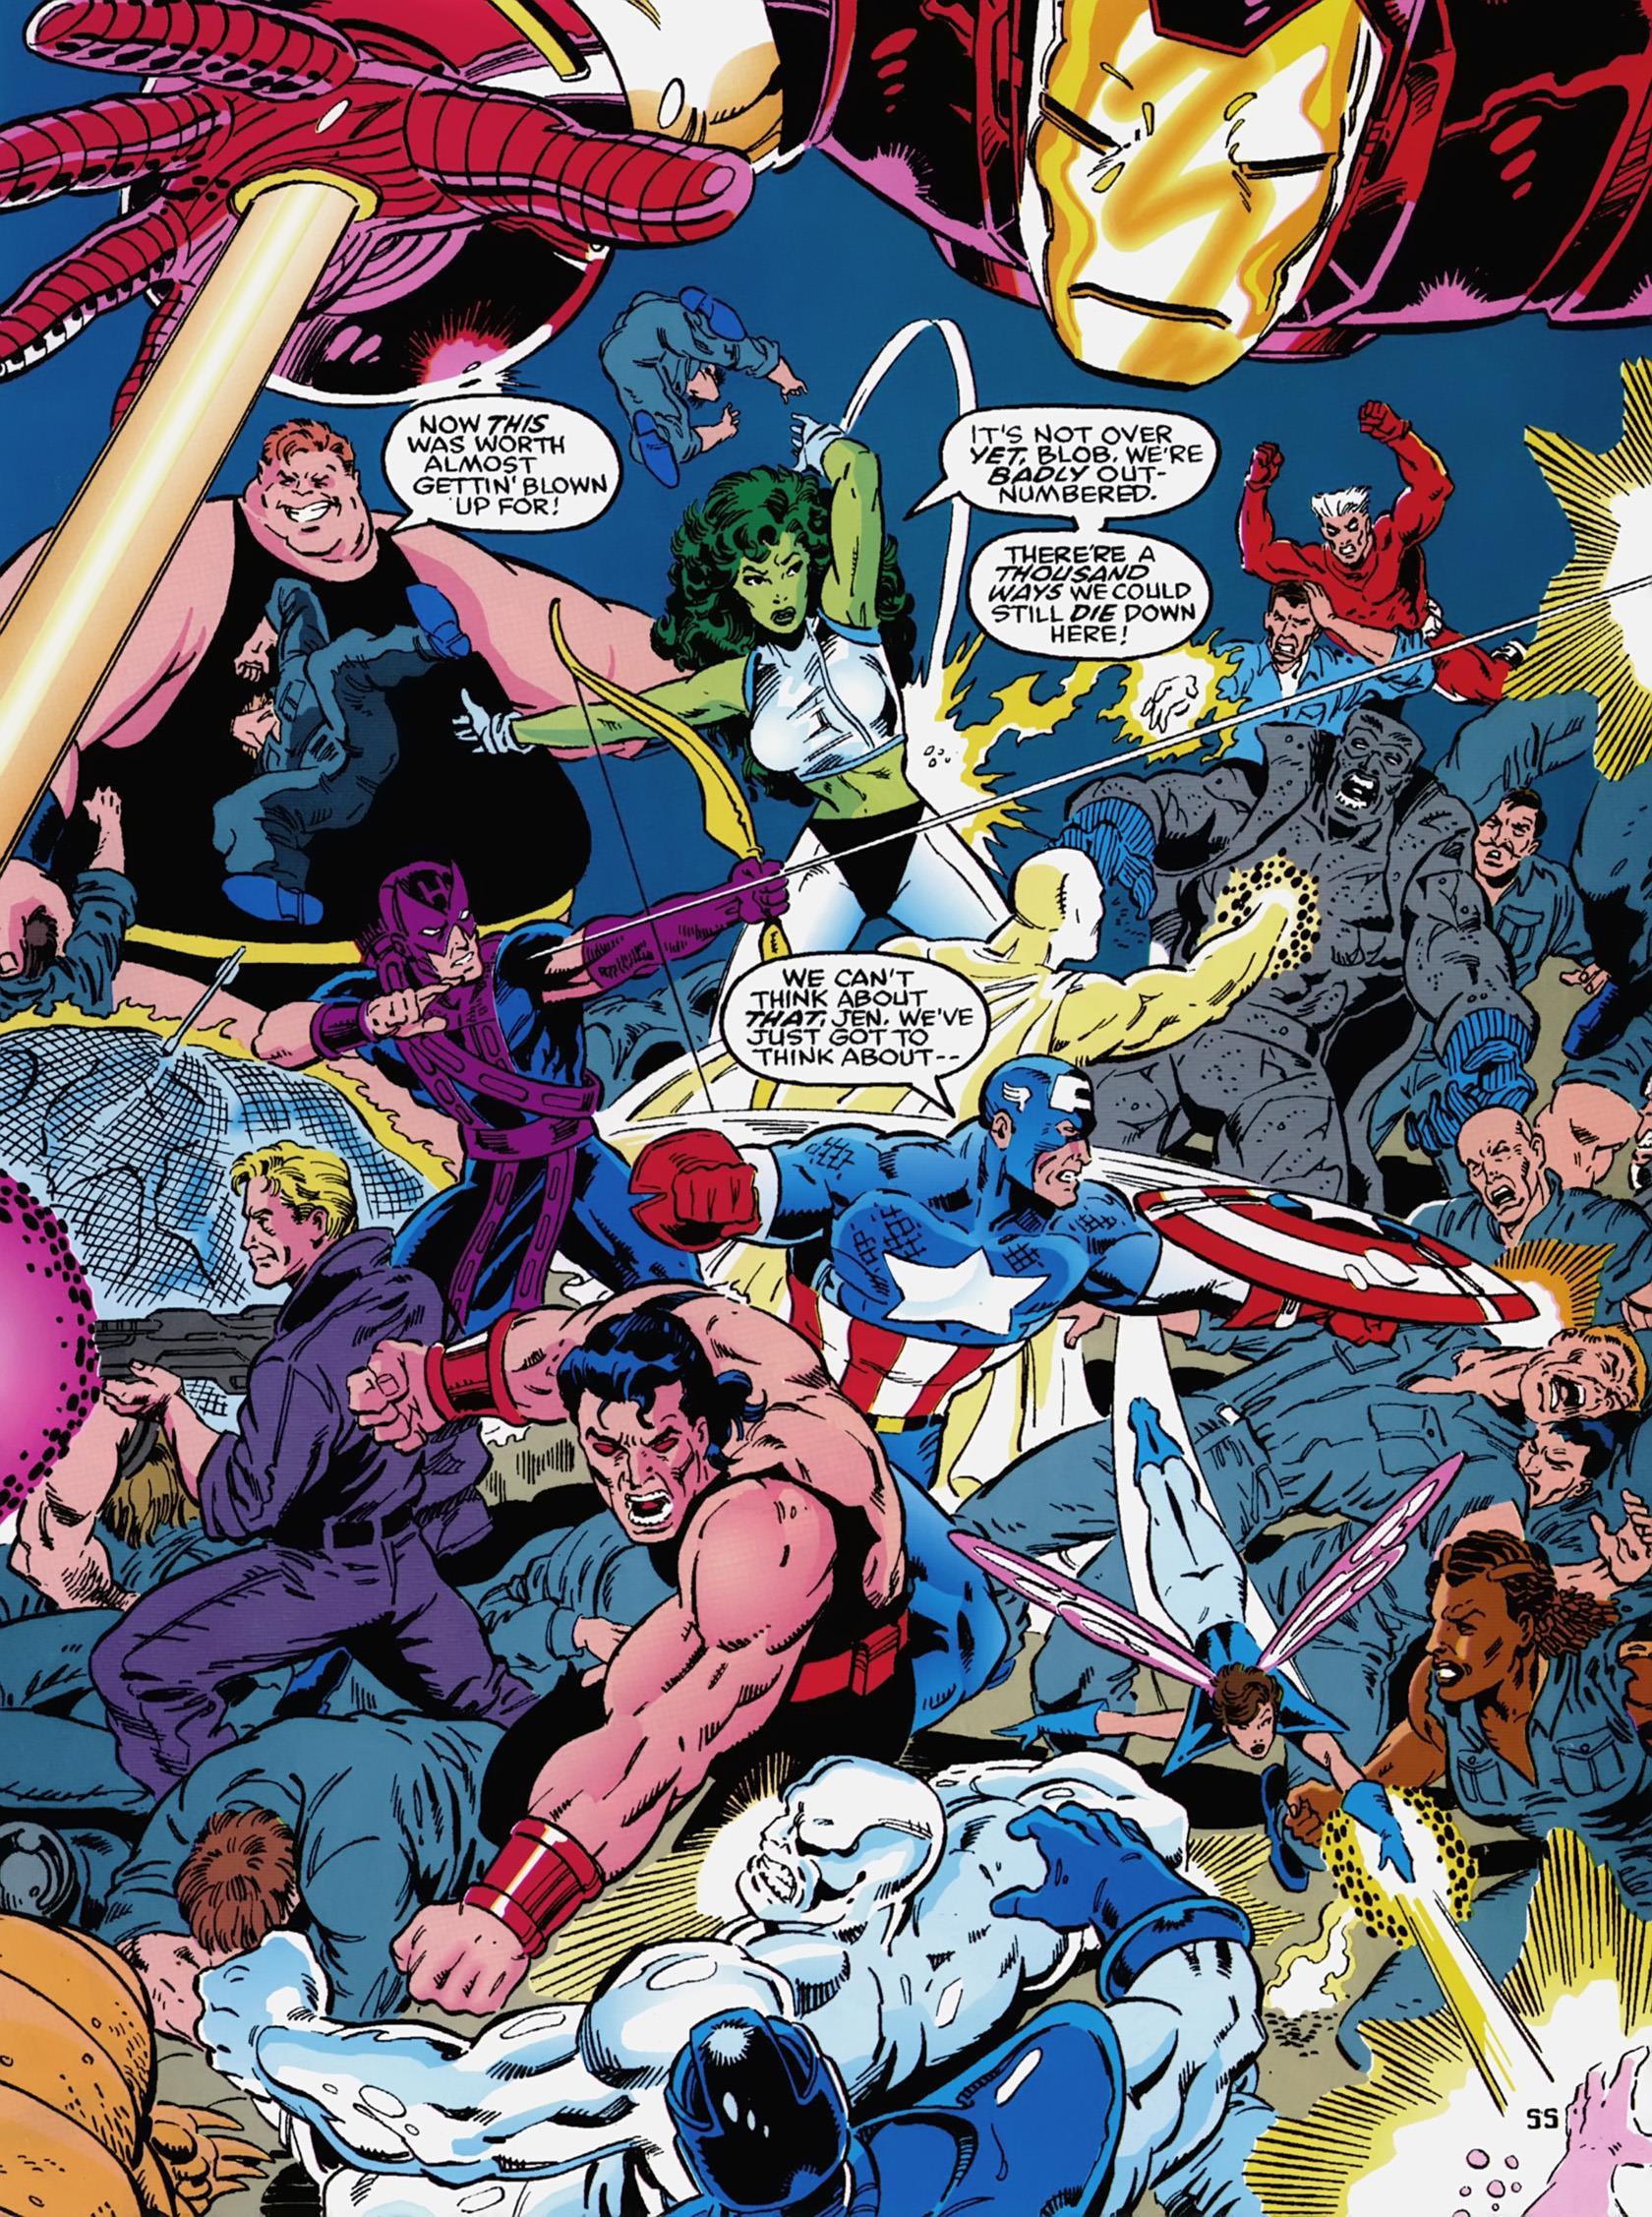 Avengers Death Trap The Vault review